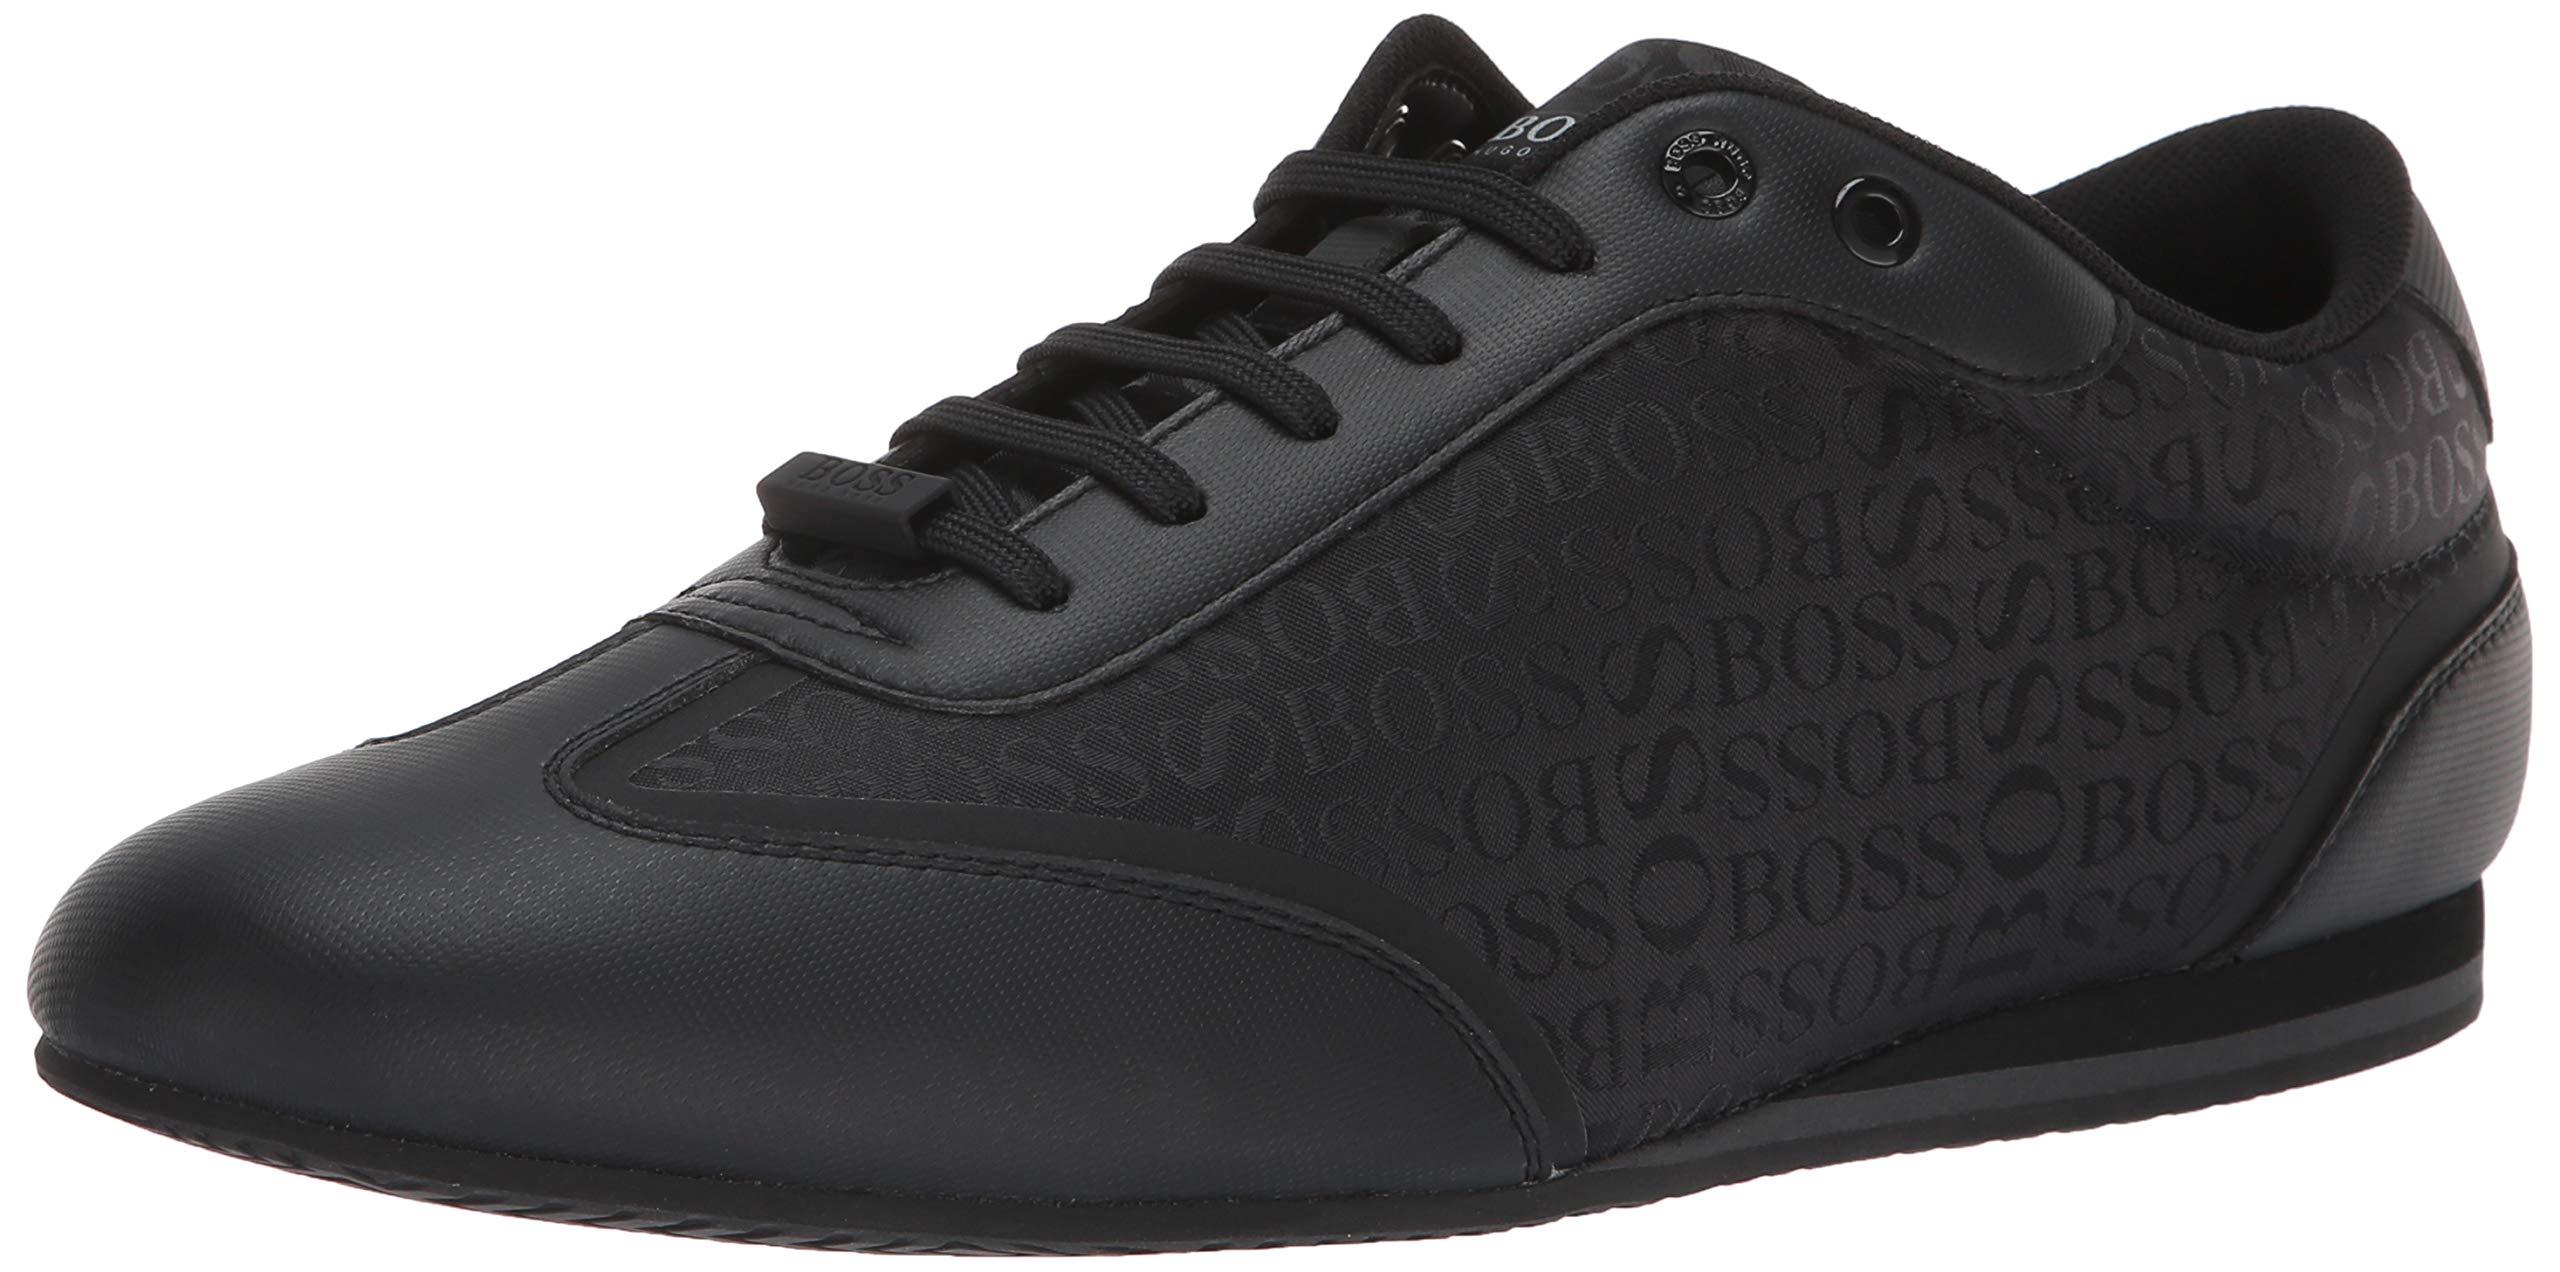 Hugo Boss BOSS Green Men's Lighter Low Boss Logo Nylon Sneakers, Black 42 Medium EU (9 US)